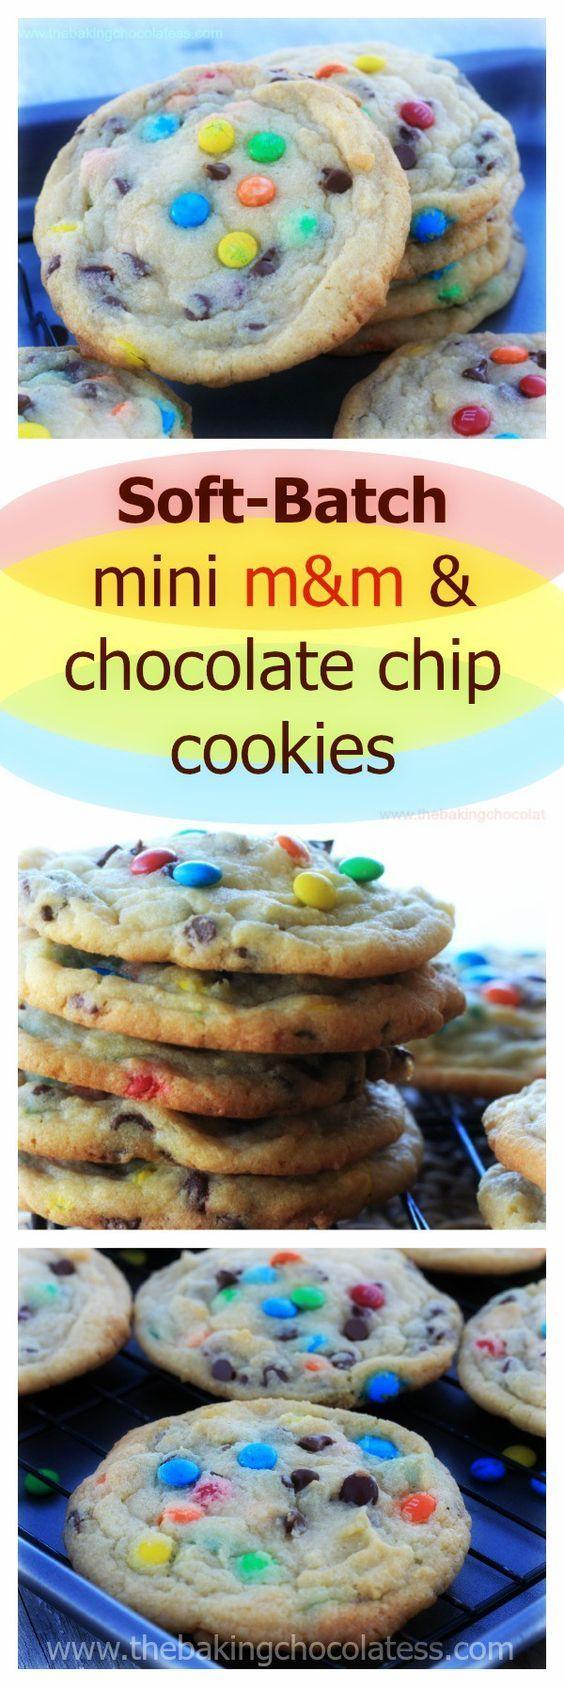 Soft-Batch Mini M&M & Chocolate Chip Cookies   The Baking ChocolaTess